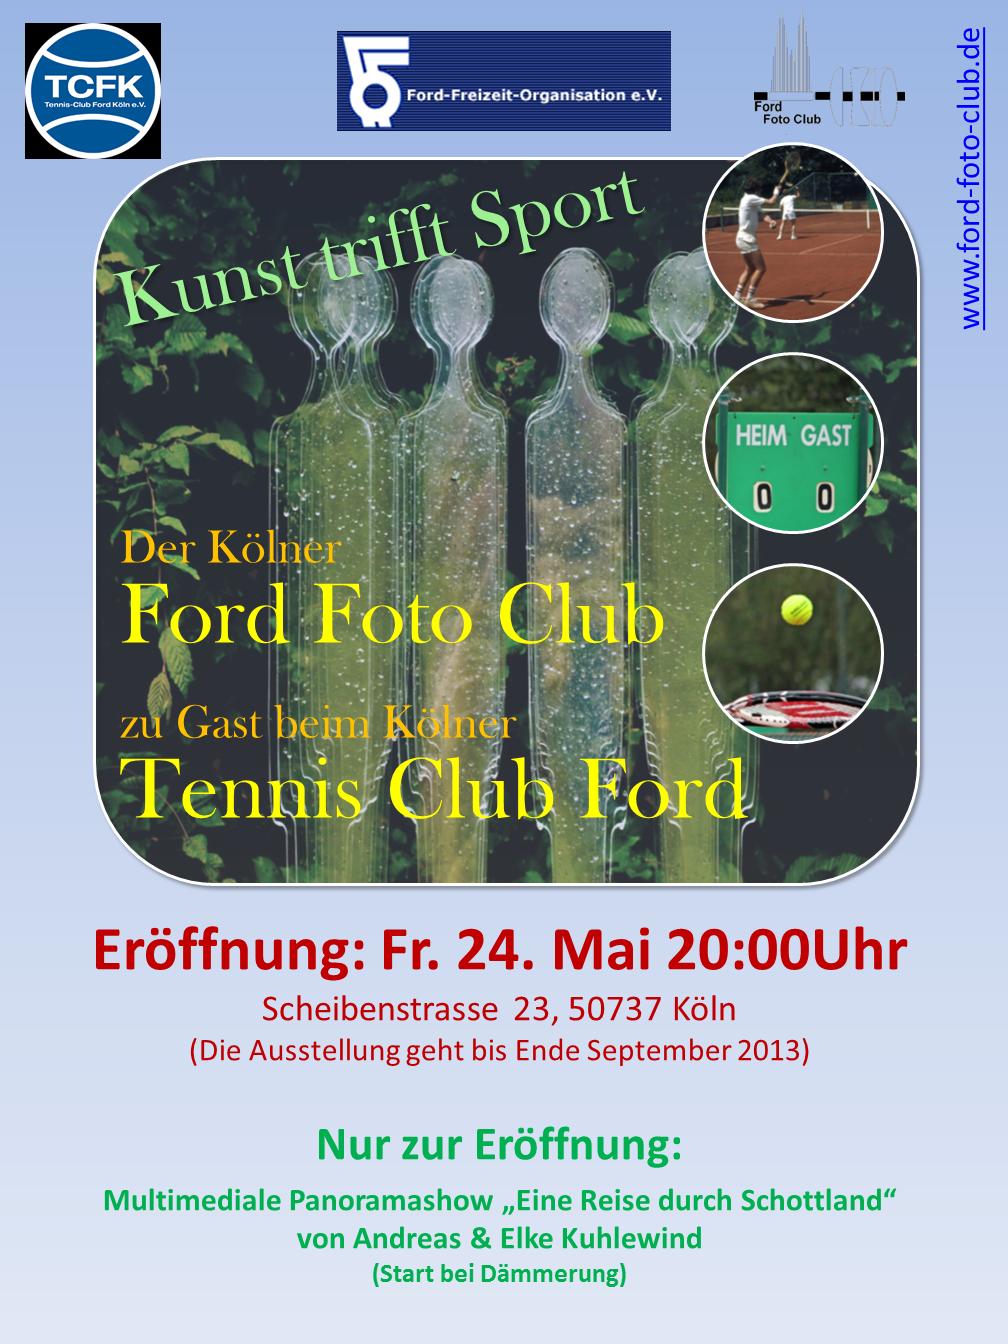 Ford_Foto-Club_Köln_zu_Gast_beim_TCFK-EB+AK+SD